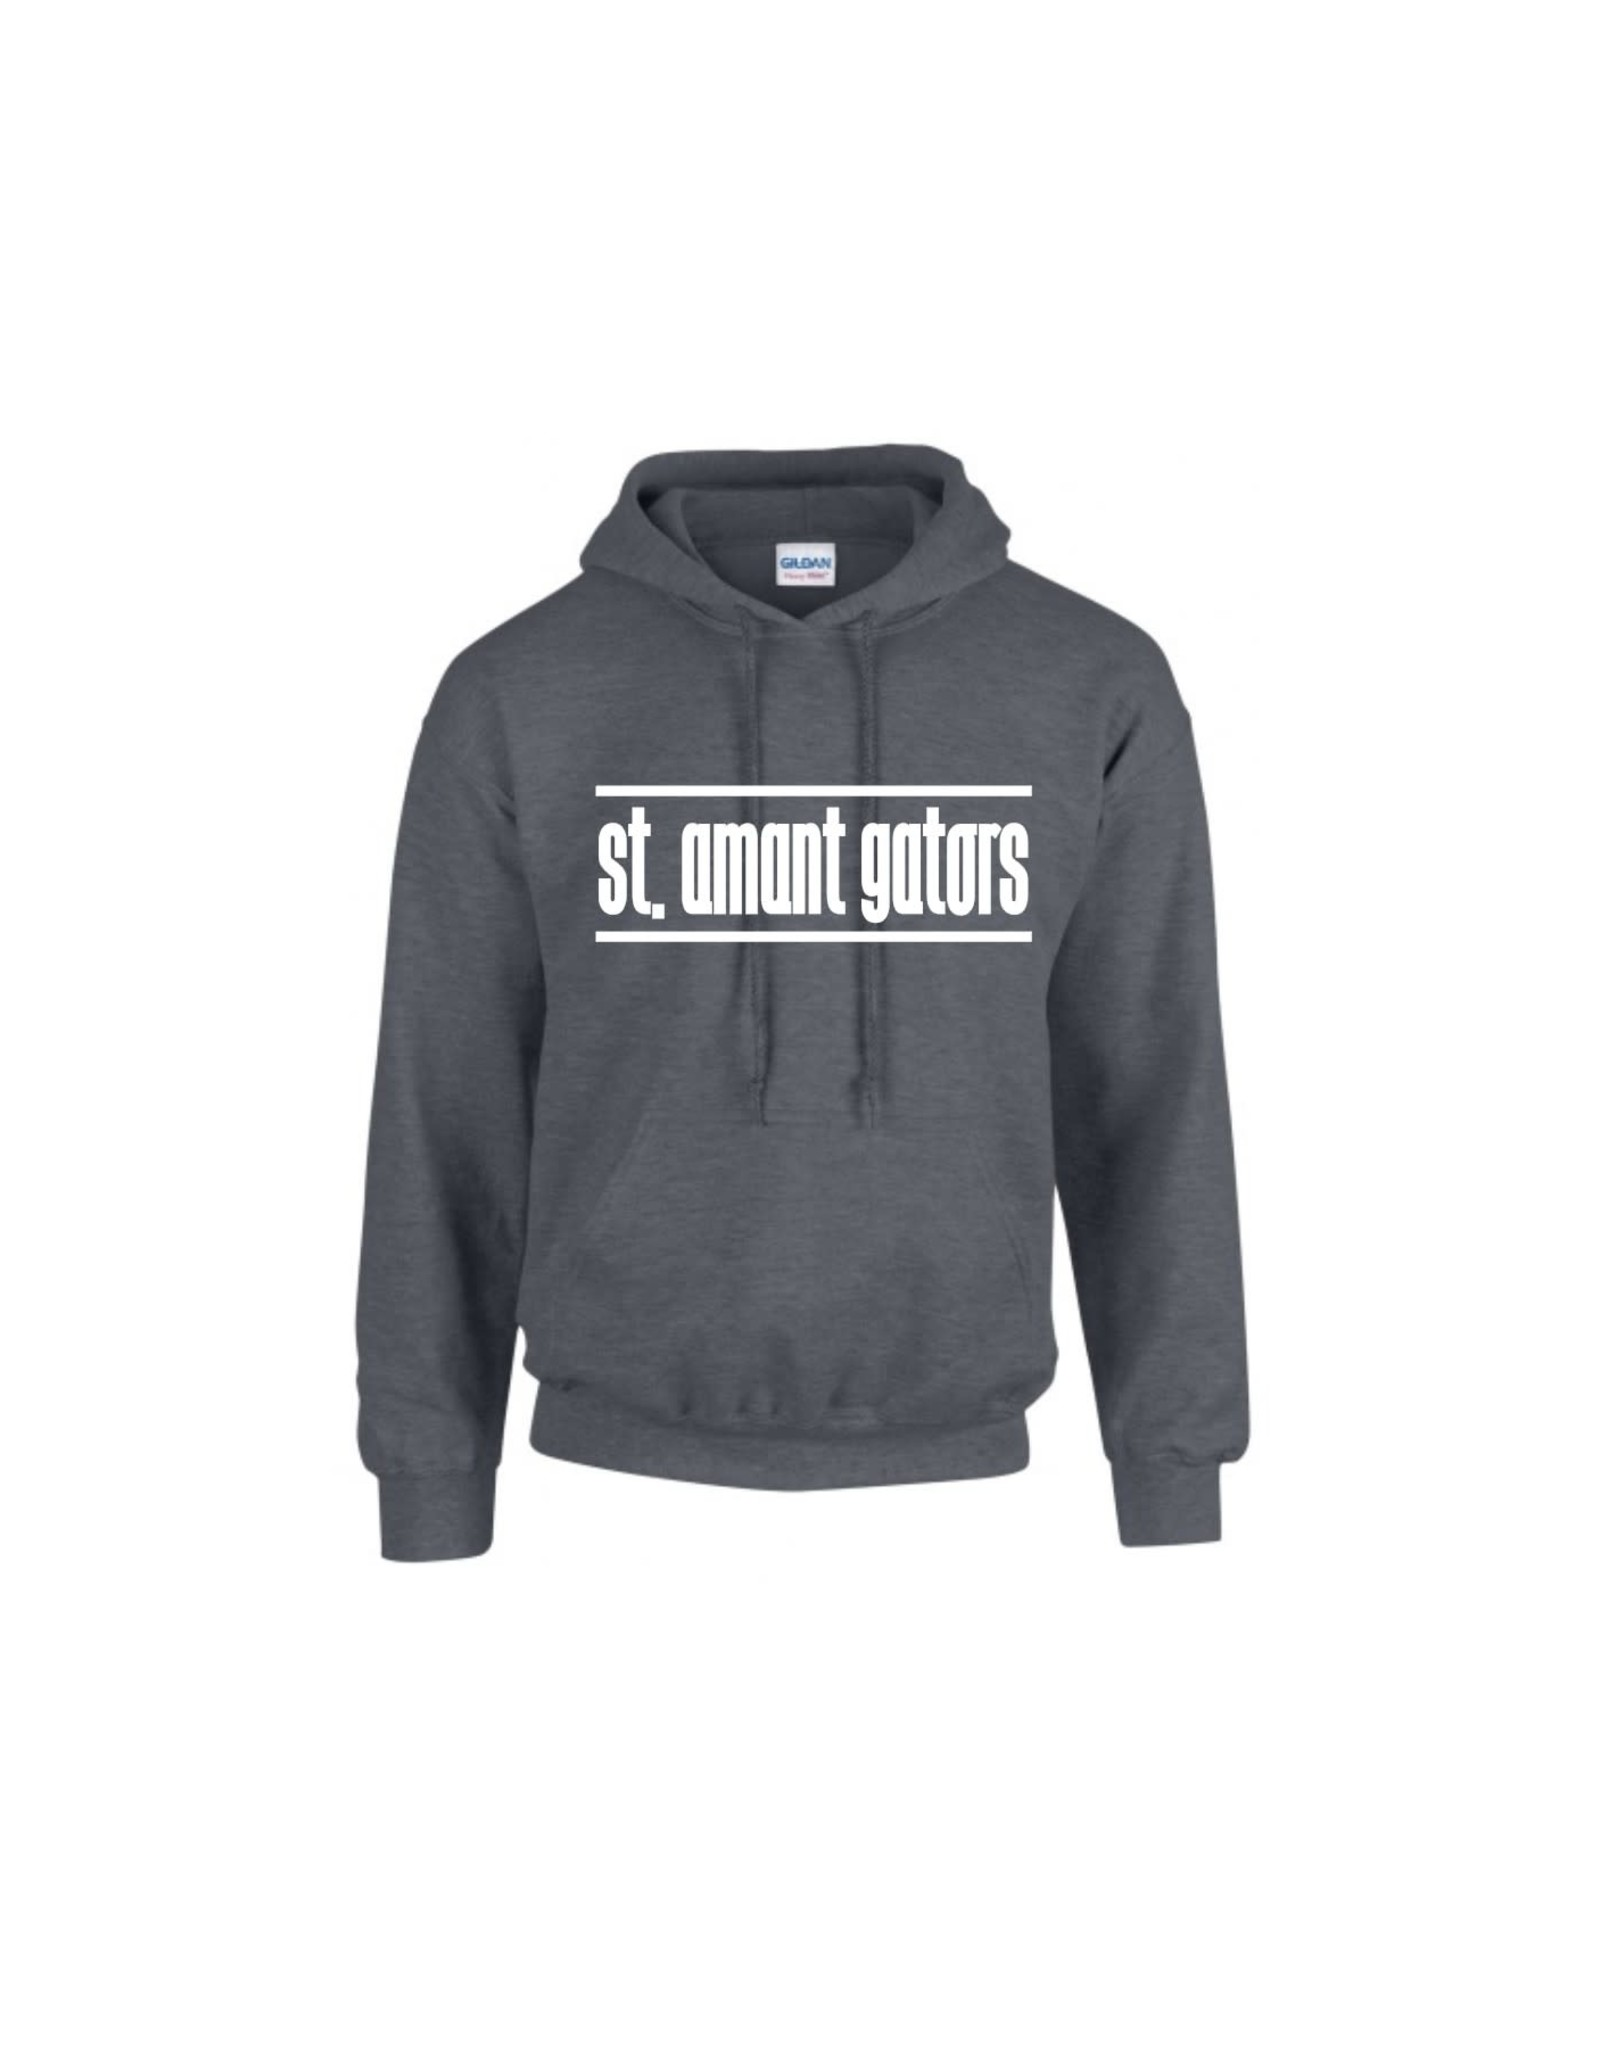 STA Hooded Sweatshirt Design 4